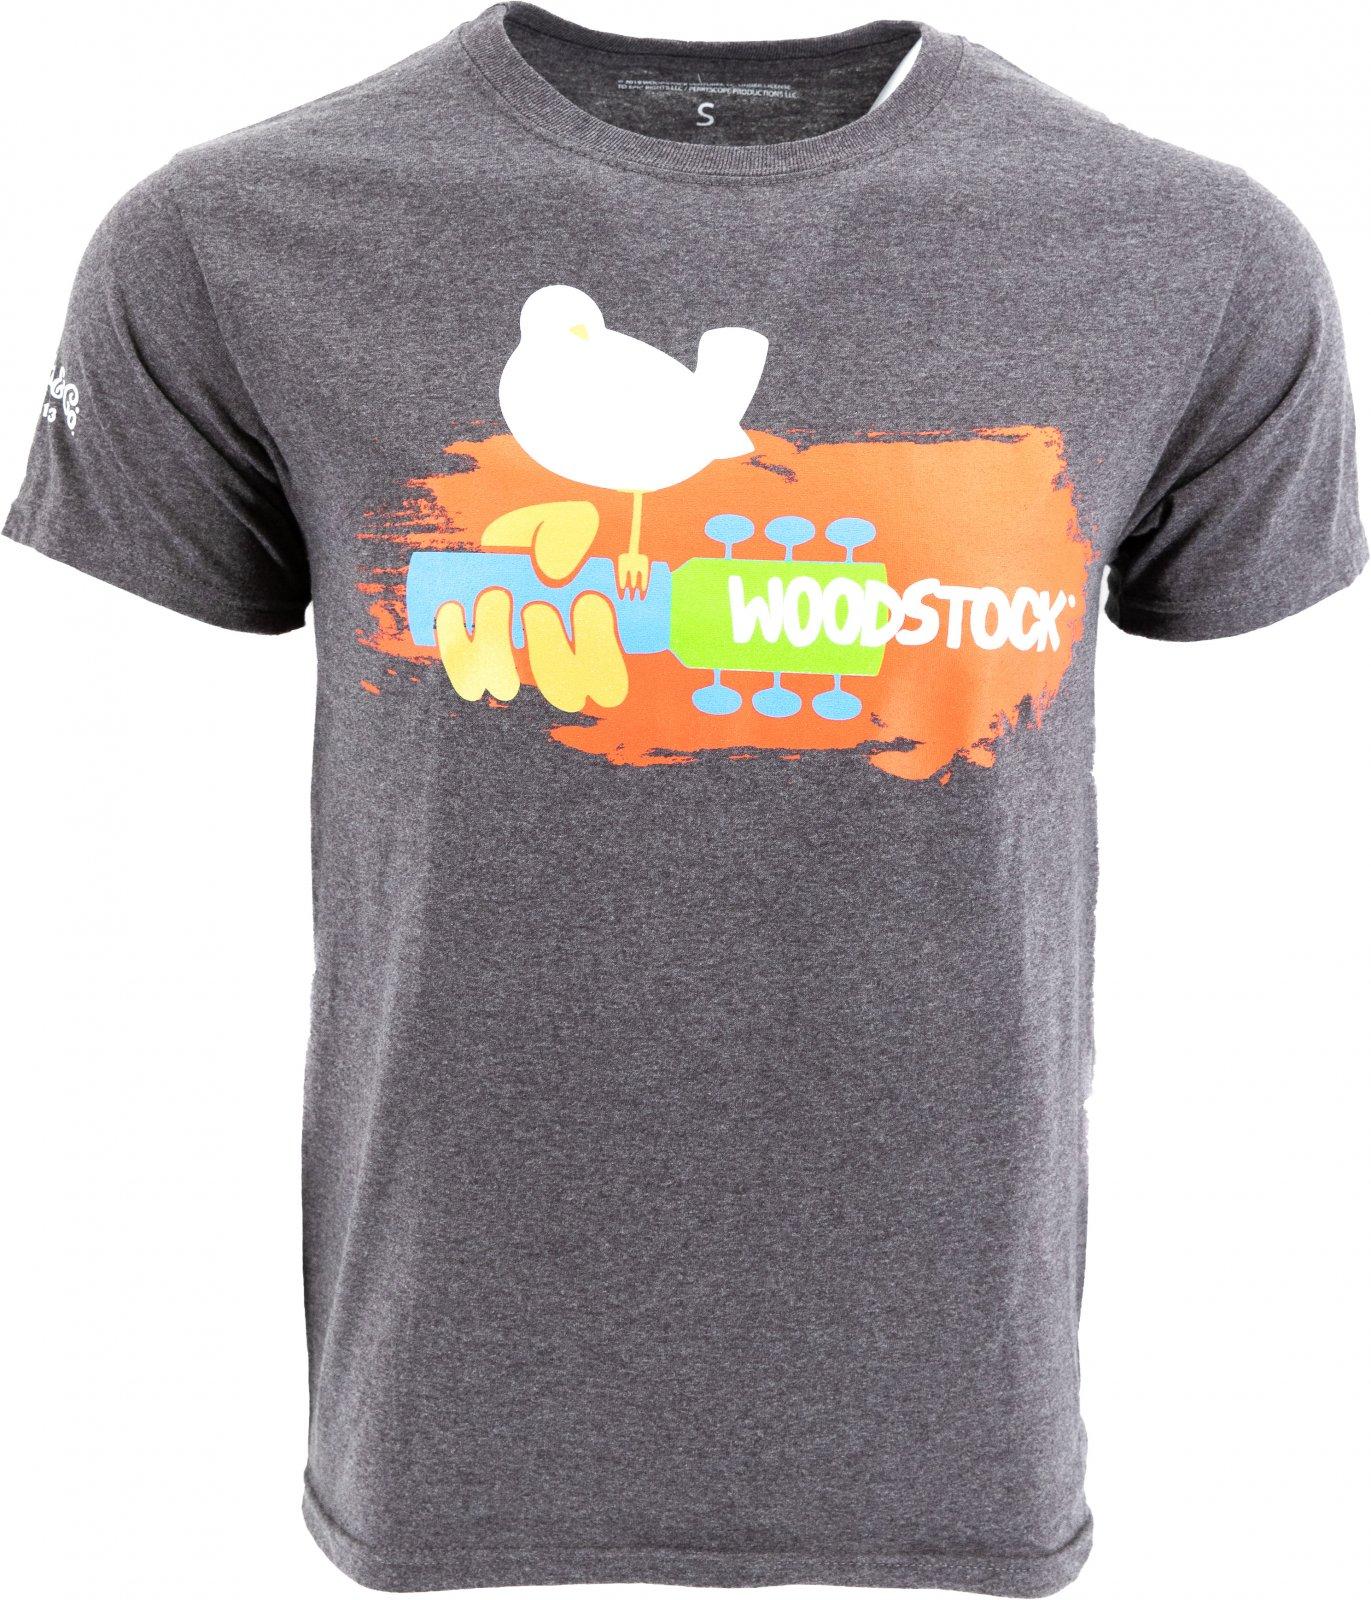 Martin 18CM0153 Woodstock T-shirt